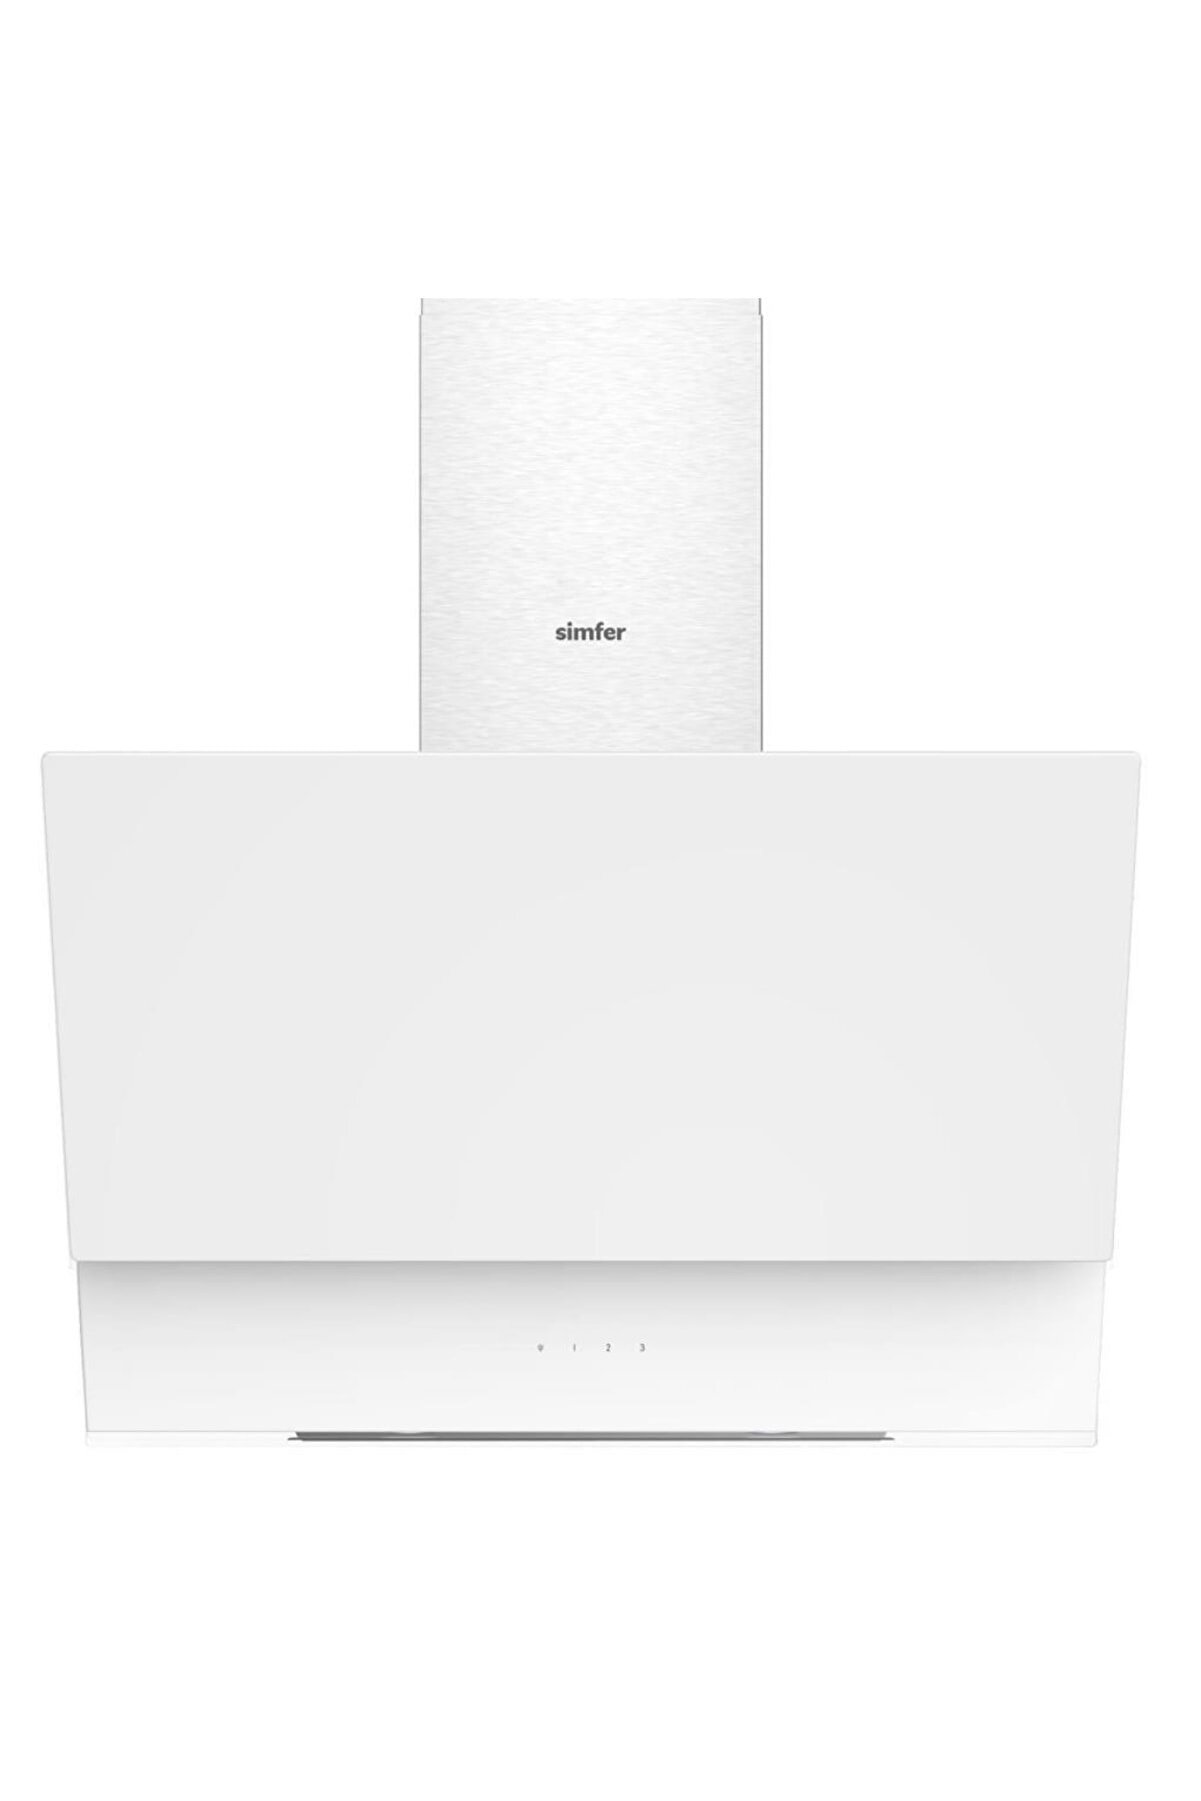 Simfer 9614 60 cm Beyaz Eğik Cam Davlumbaz Dokunmatik + Led Lamba